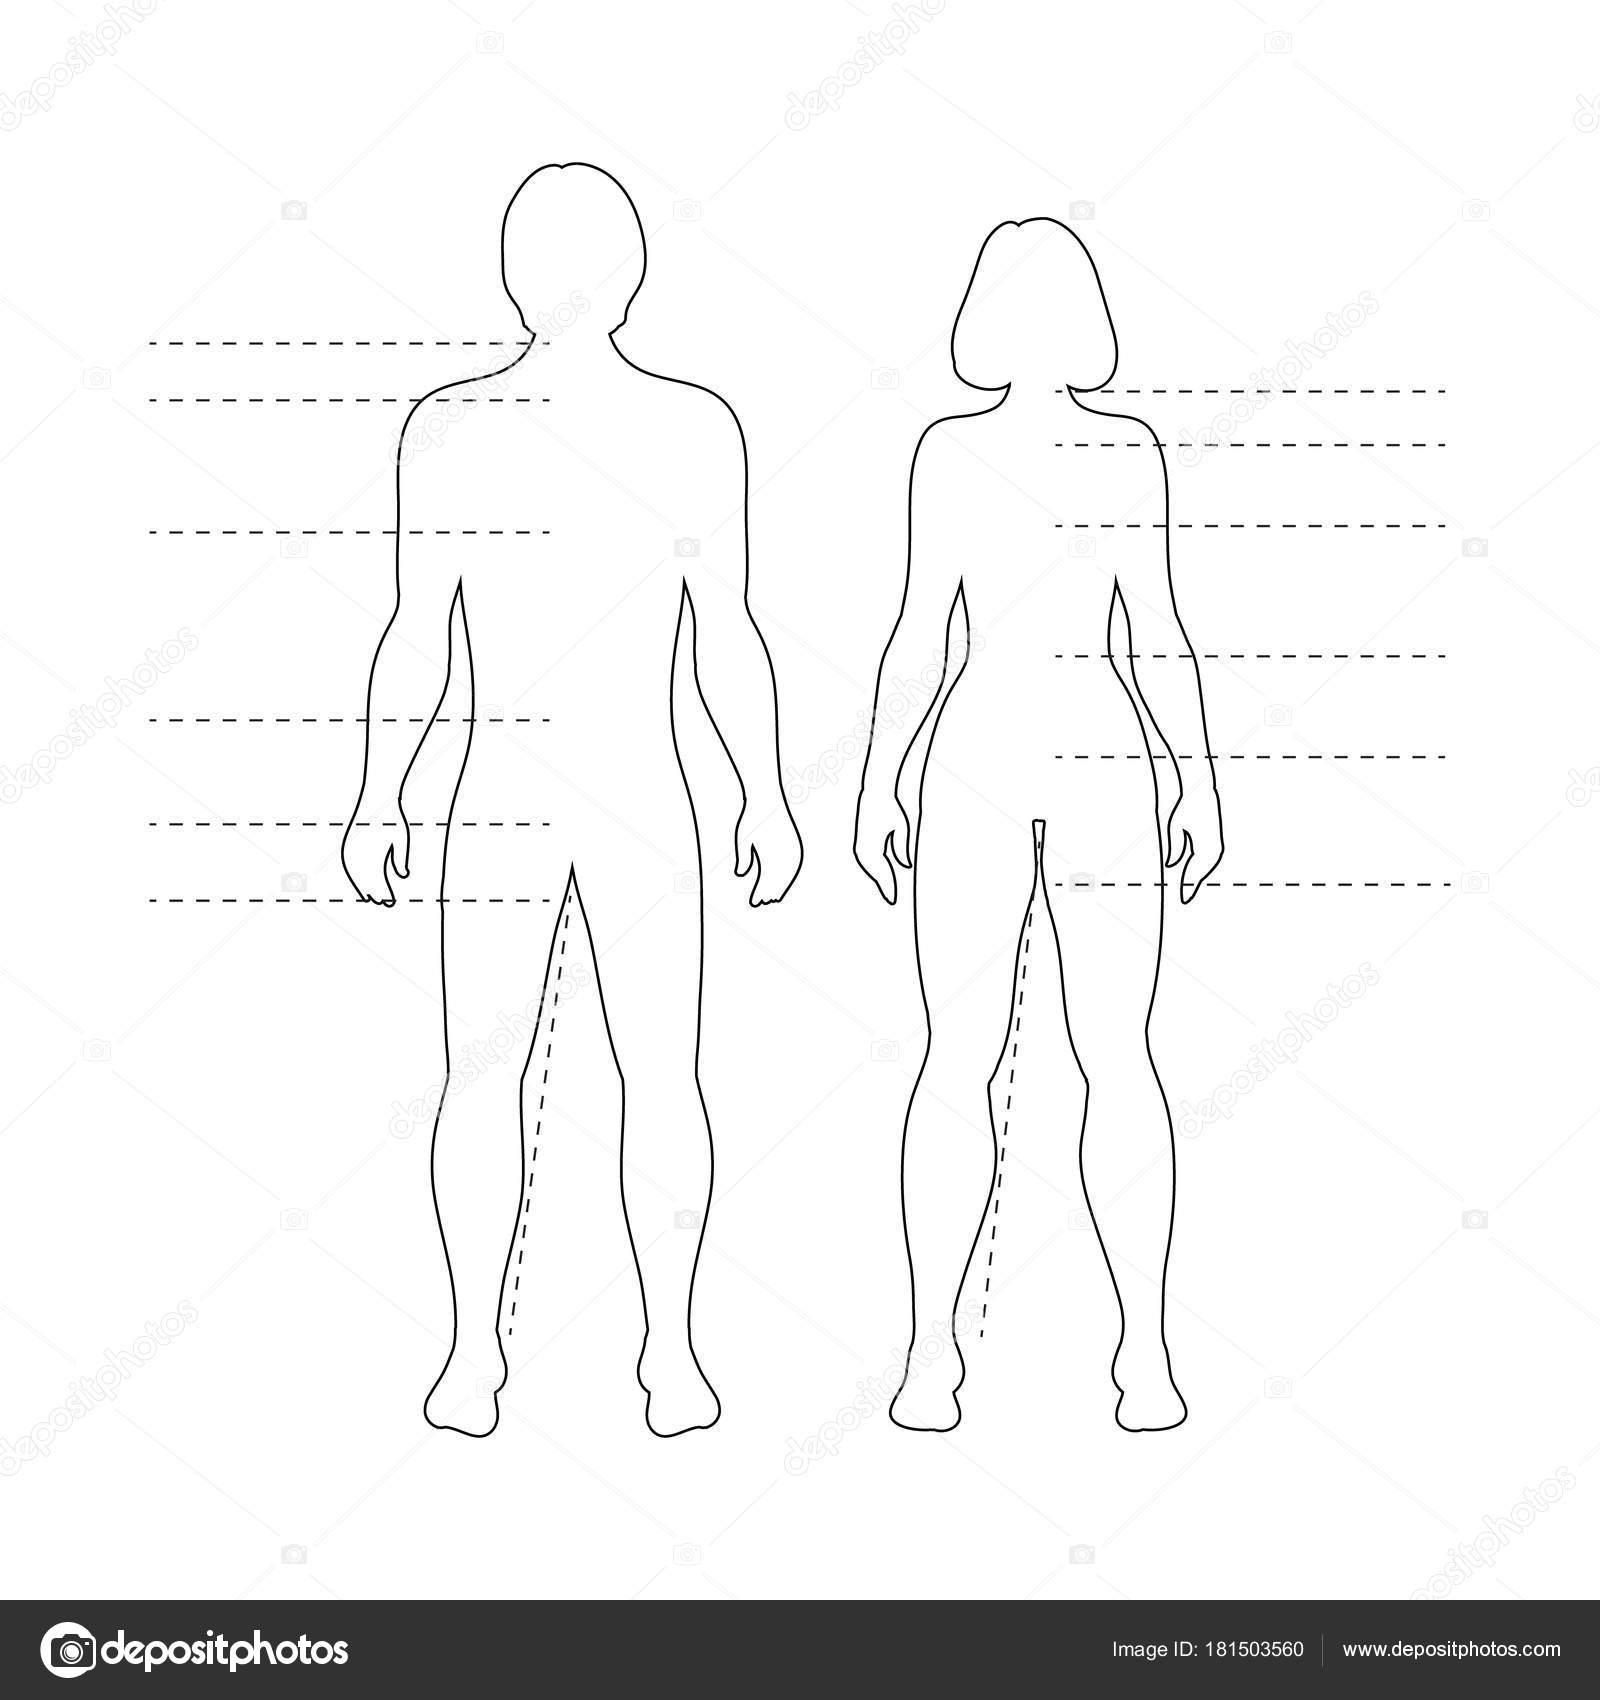 outline human body image